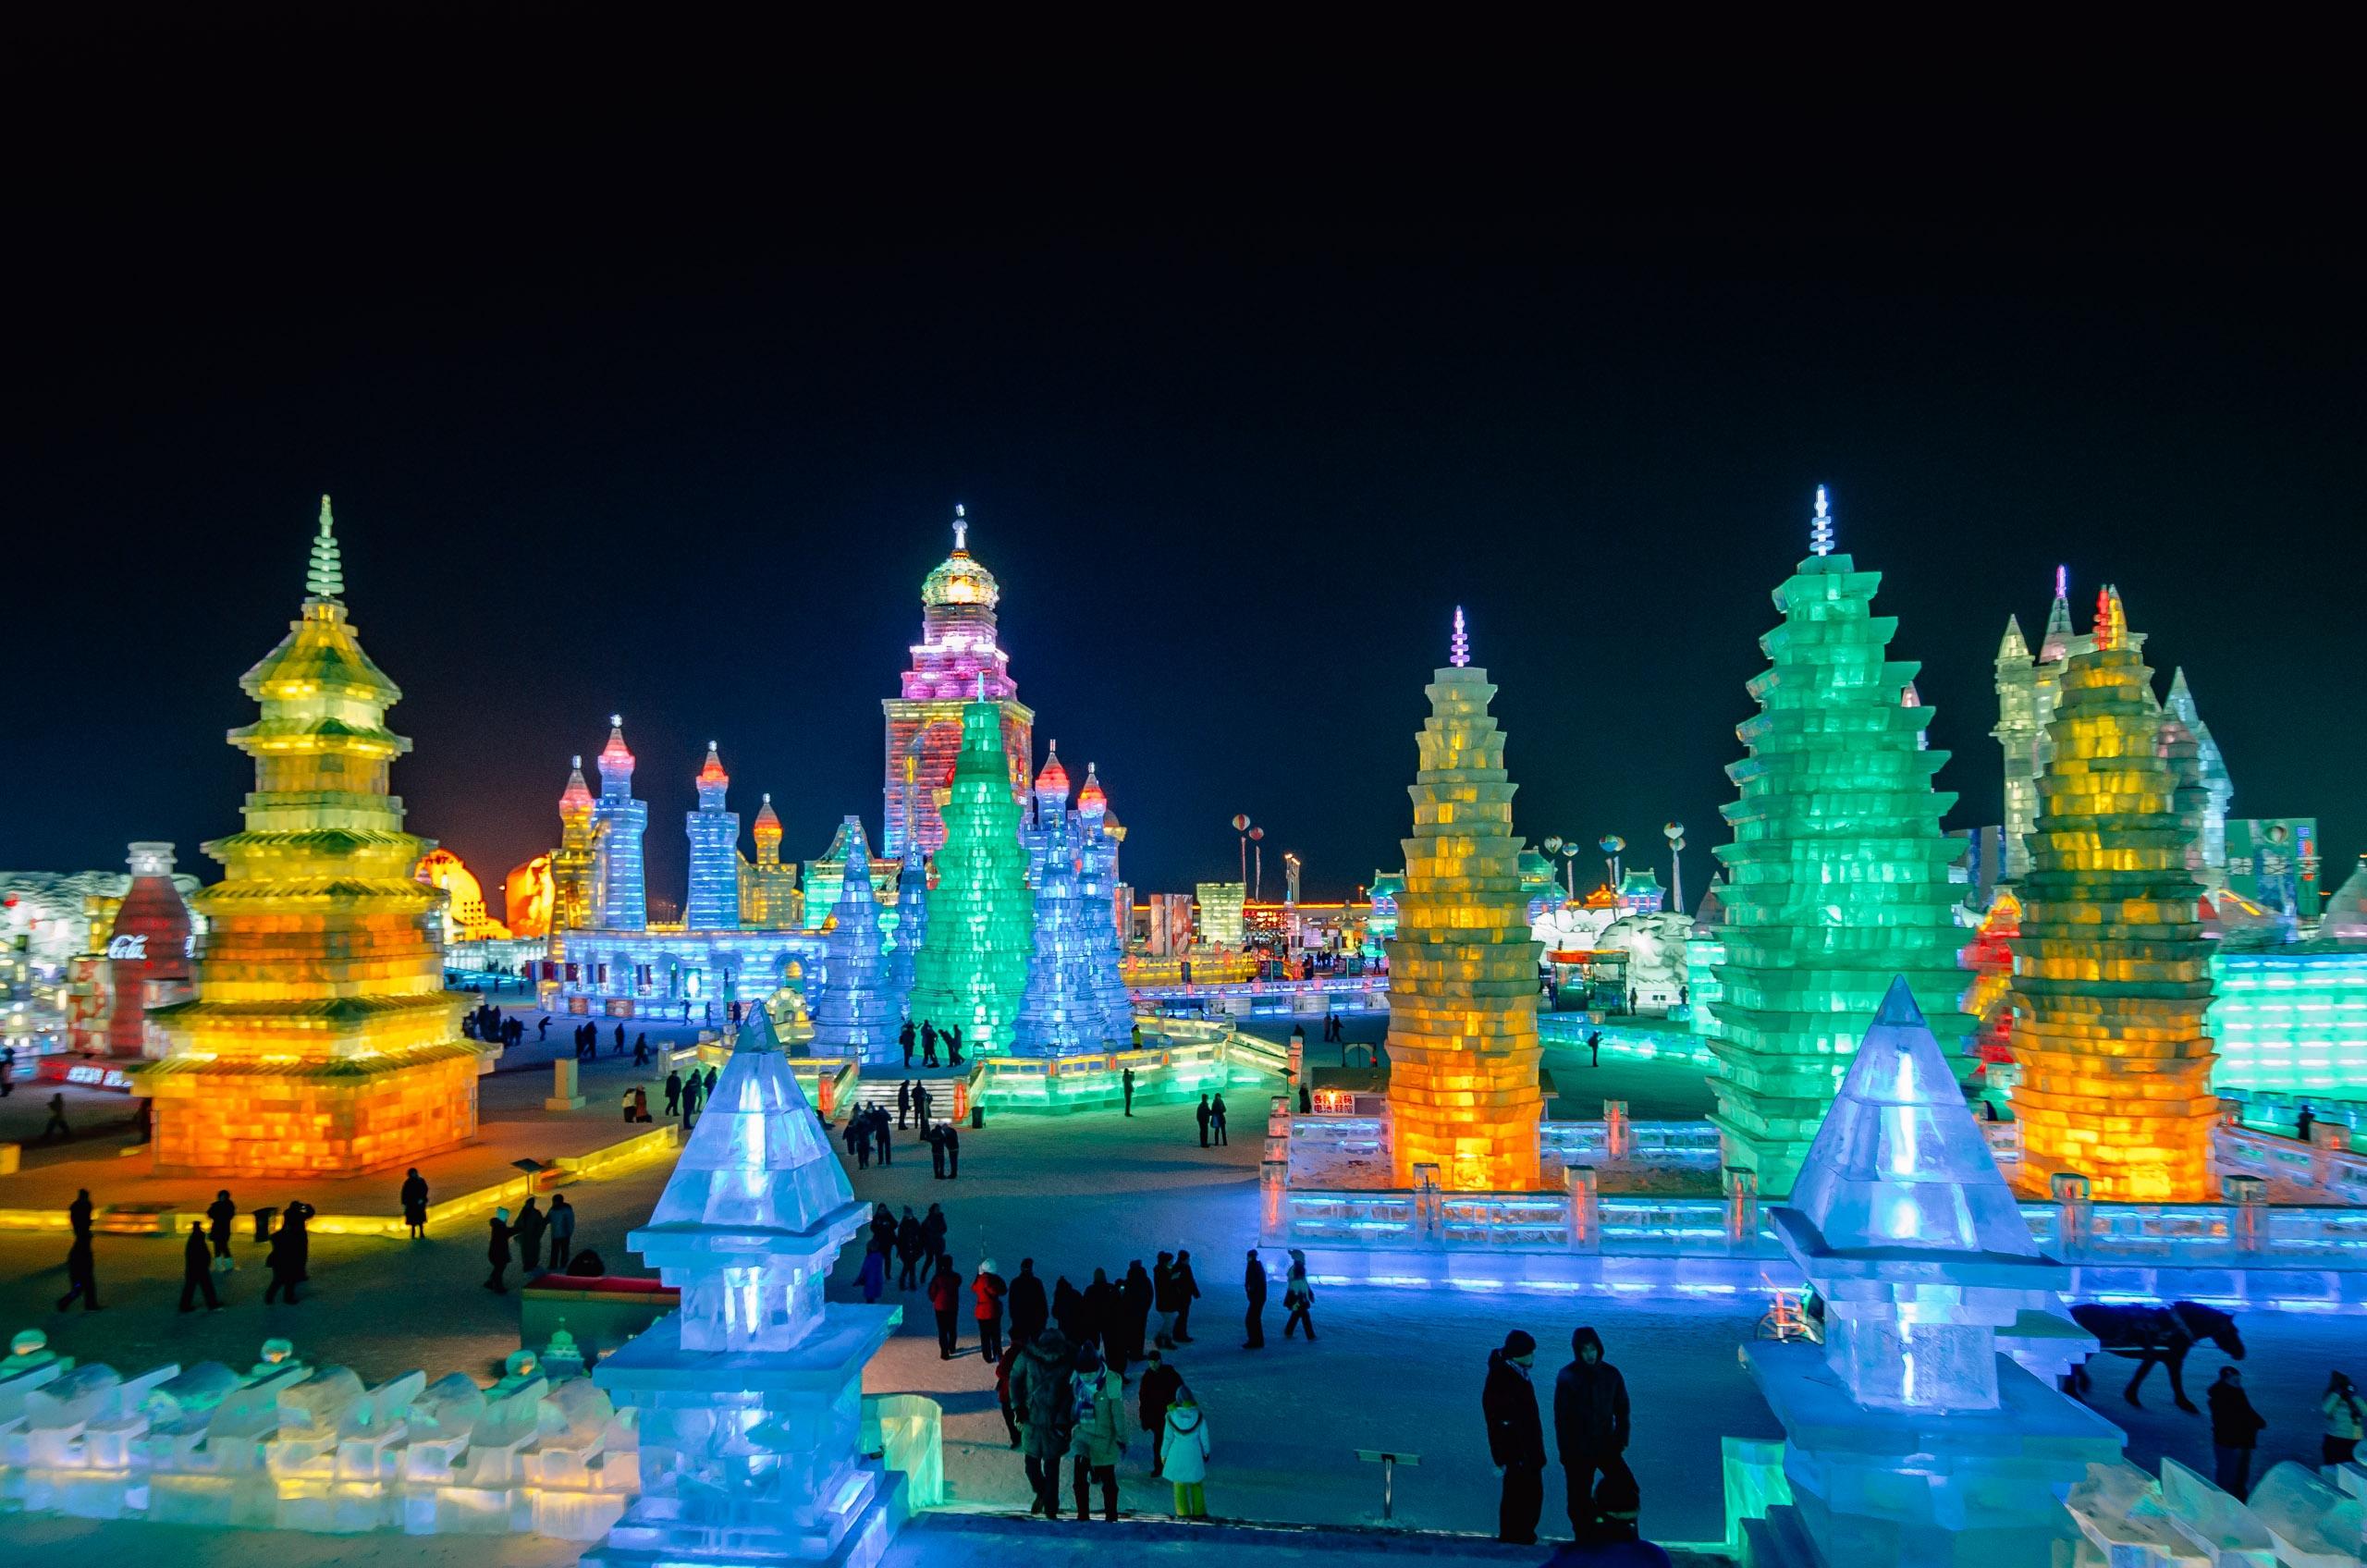 Harbin China Ice Festival - 2012-0108-DSC_2014_109540